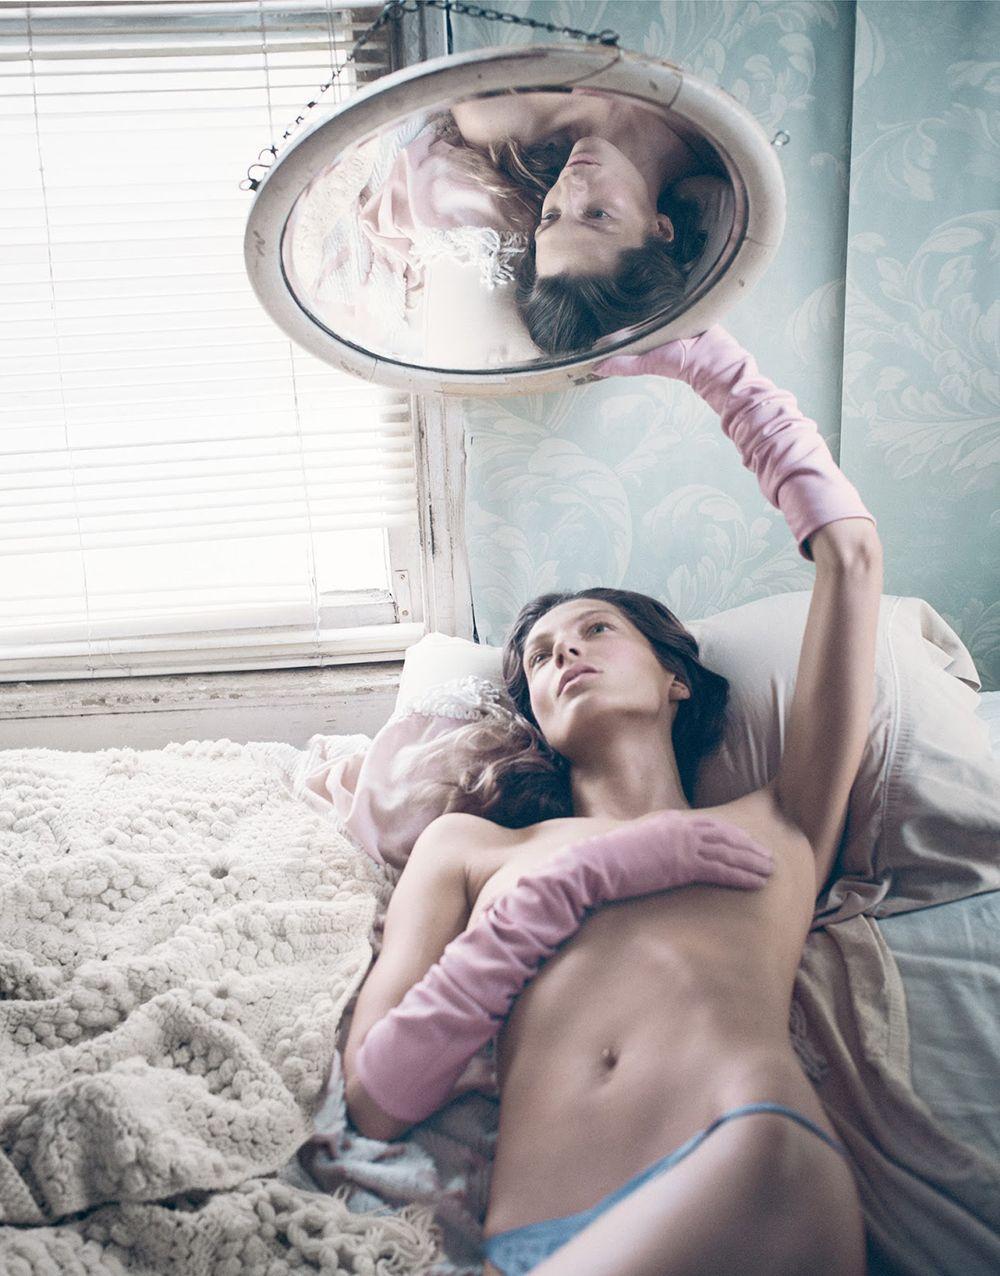 Daria Werbowy Bikini Pics 97